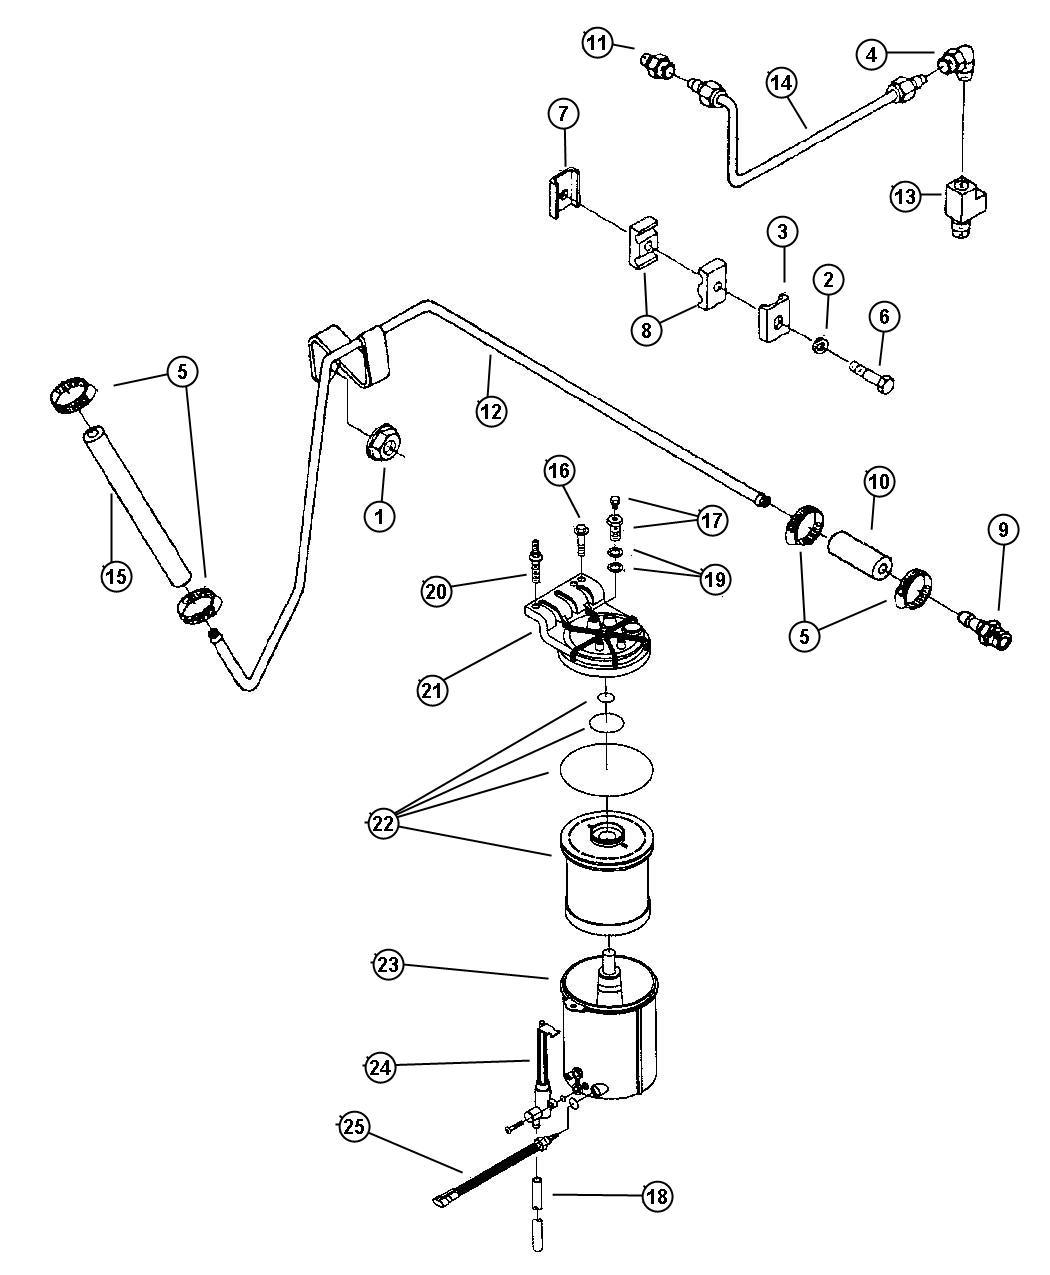 Dodge Ram Air Fuel Control And Fuel Filter